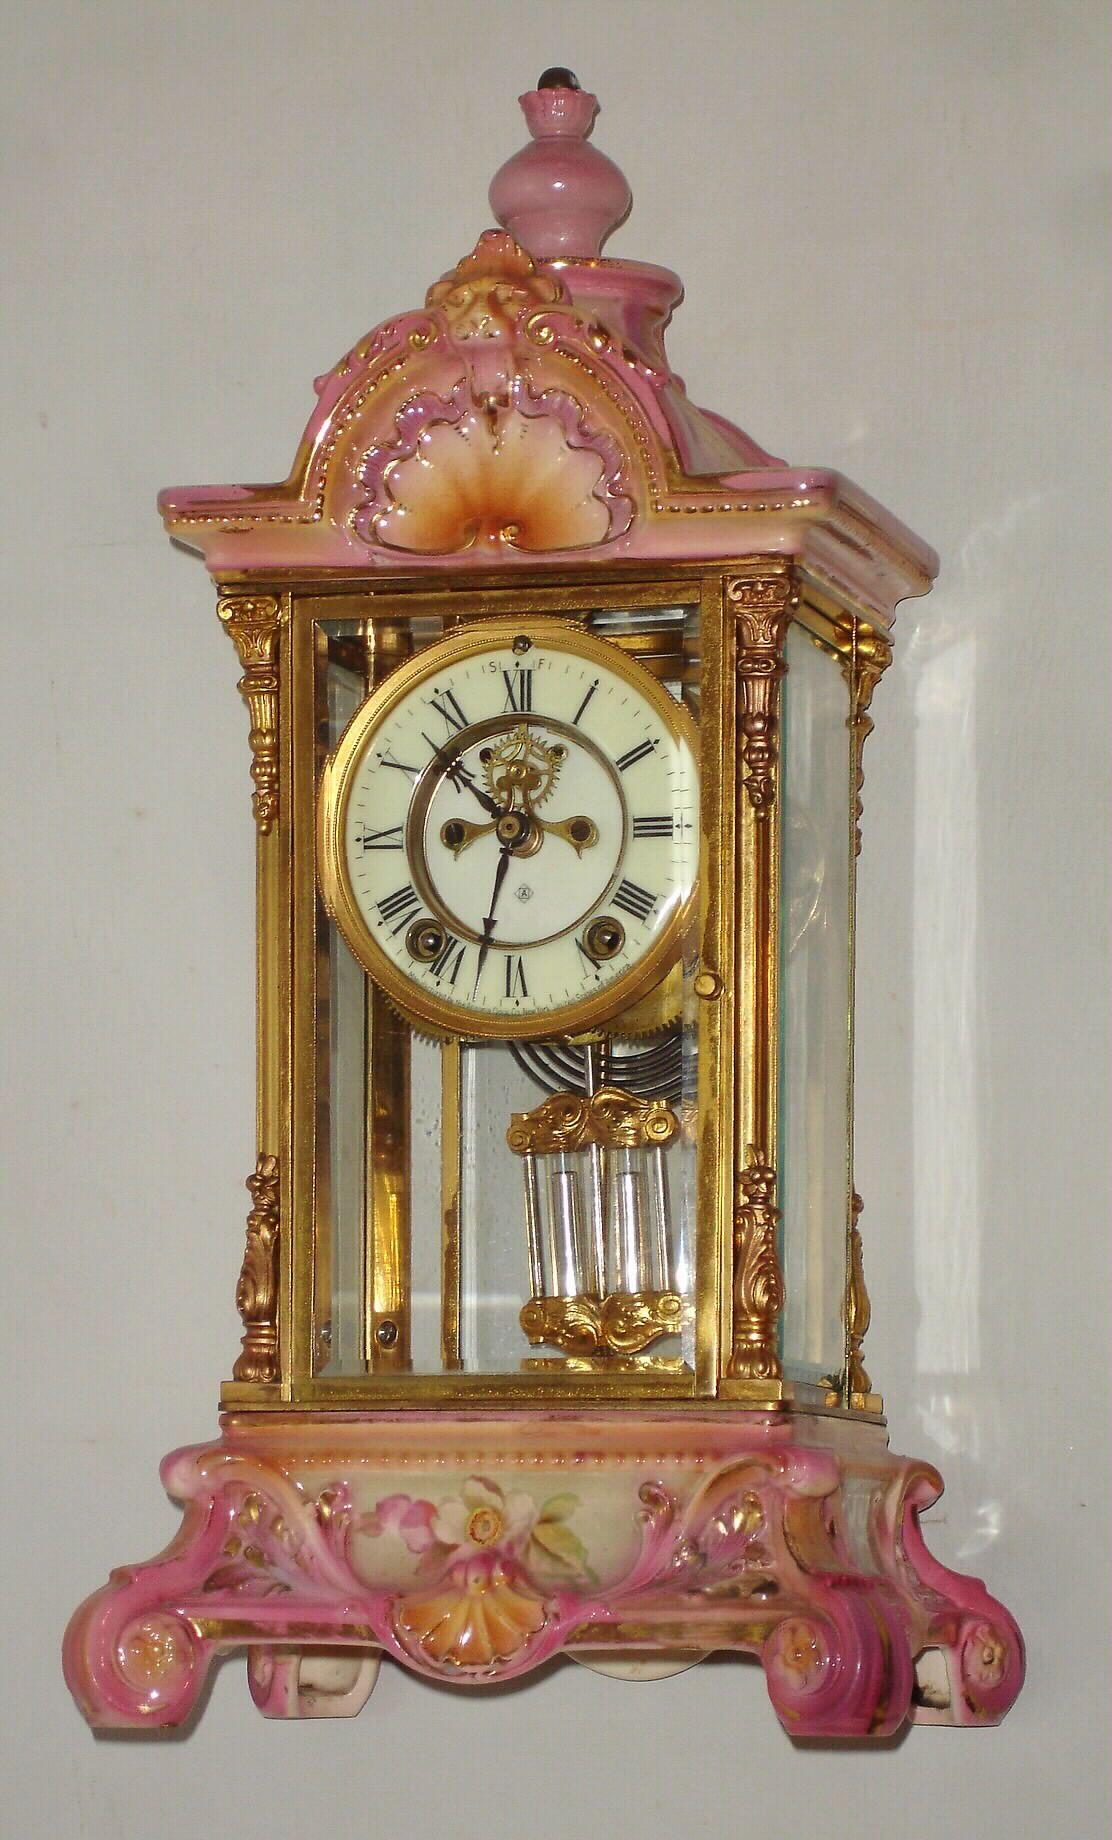 Antique Clock Details Antique Clock Antique Wall Clocks Antique Pendulum Wall Clock